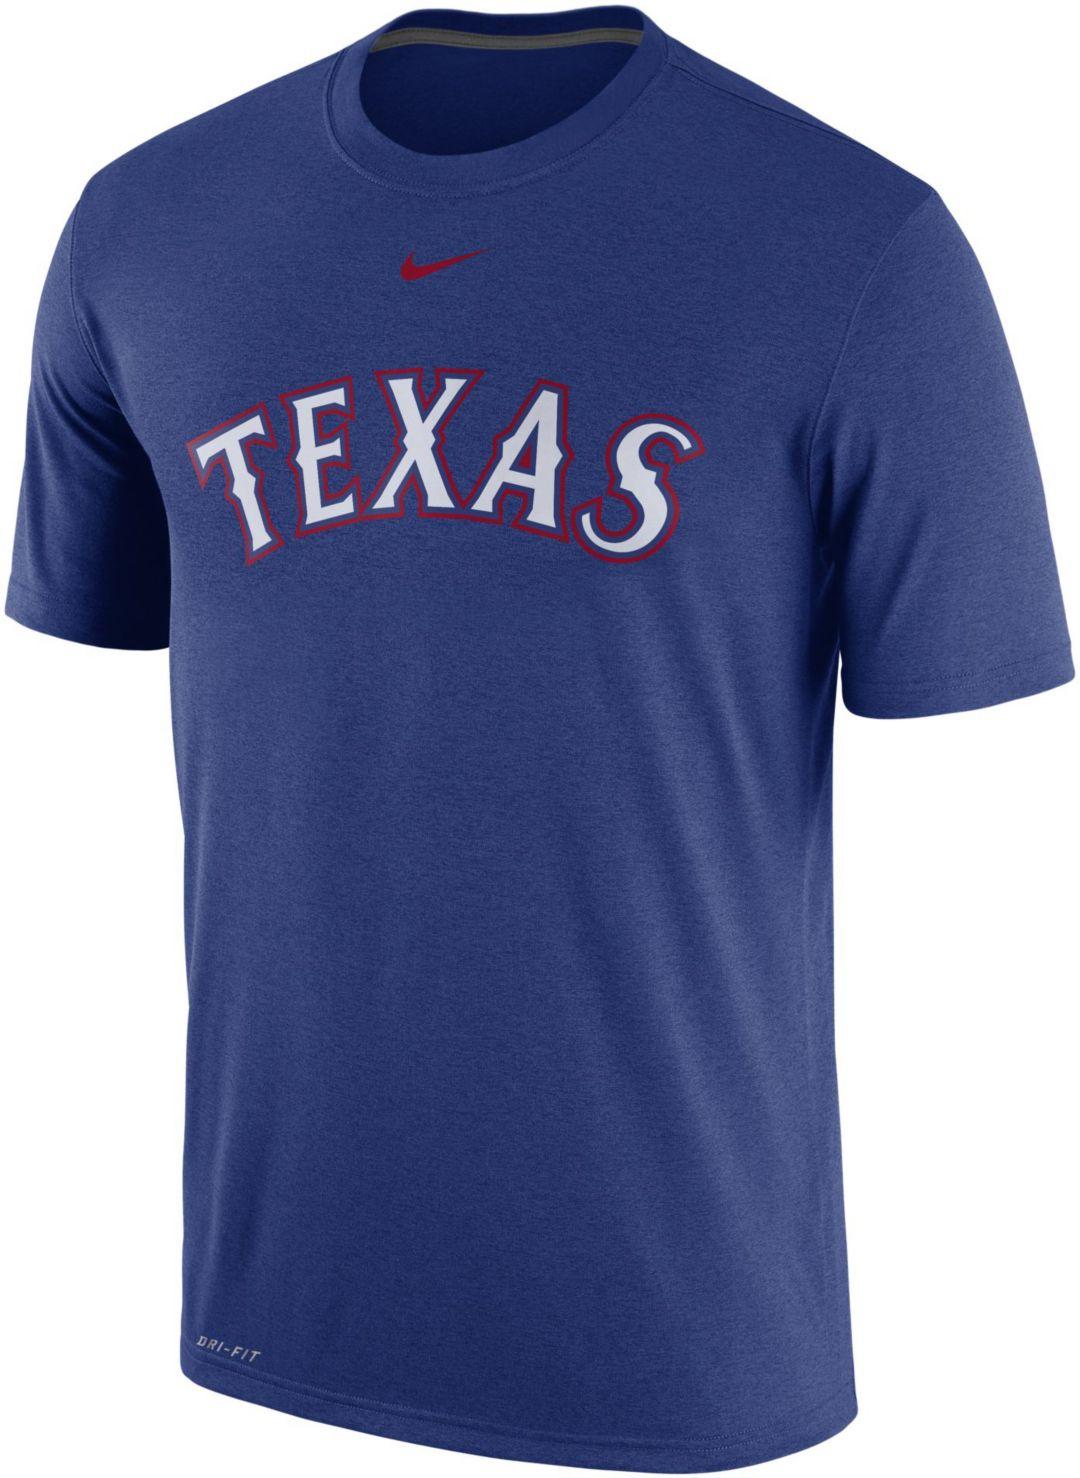 18230bb5c Nike Men's Texas Rangers Dri-FIT Legend T-Shirt